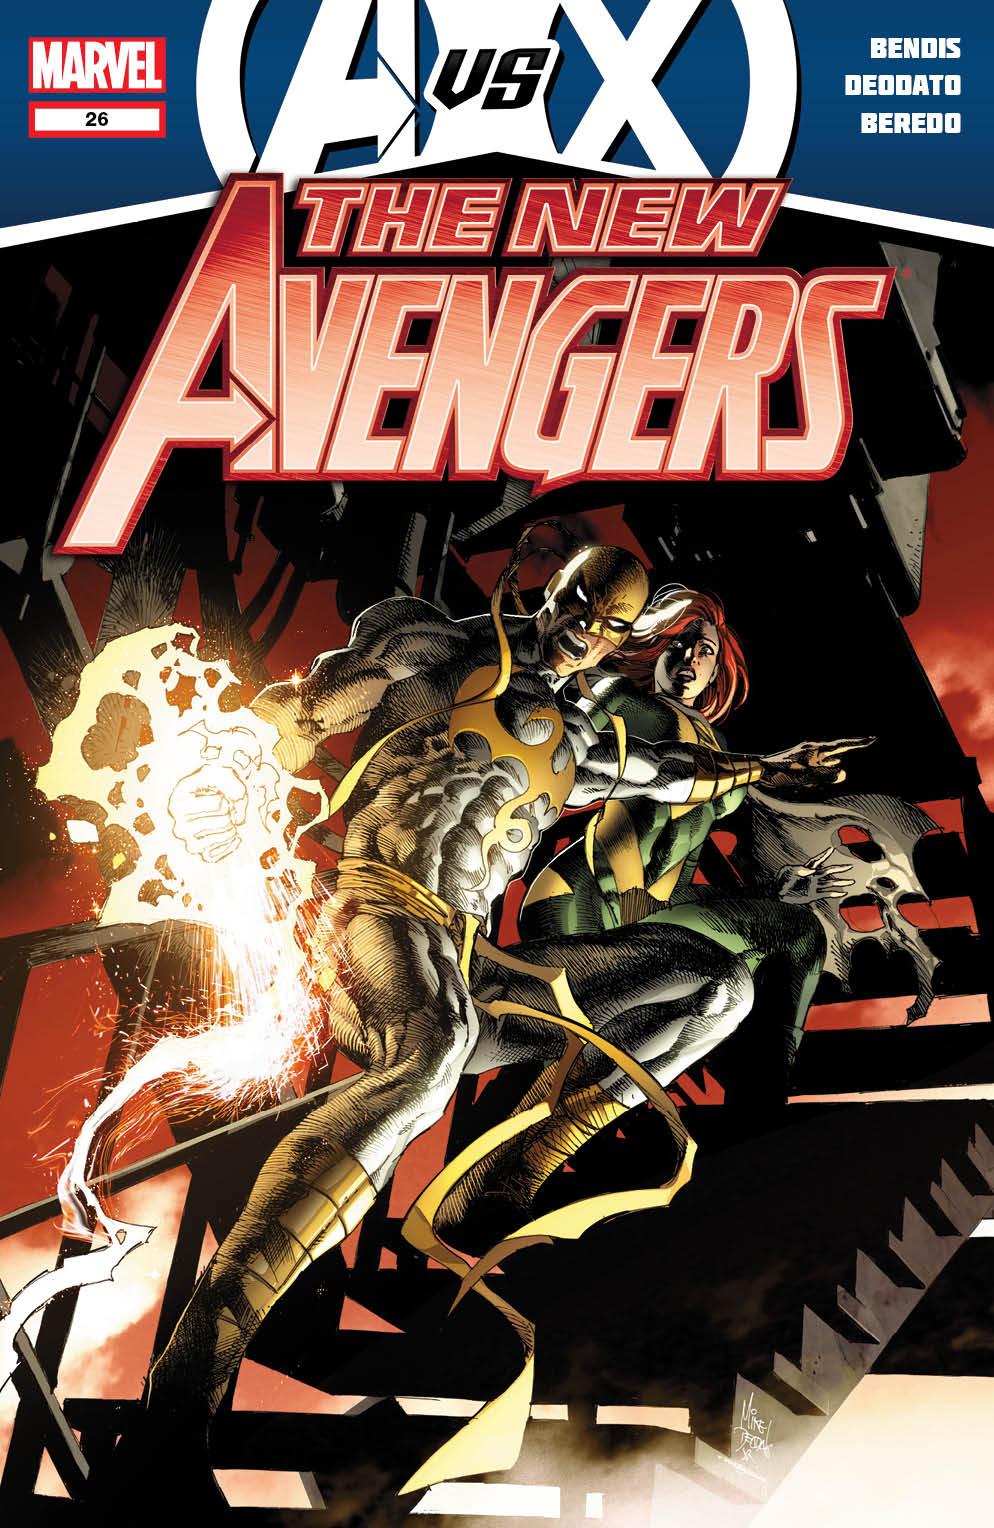 NewAvengers_26_Cover Marvel releases more May AVENGERS VS. X-MEN covers